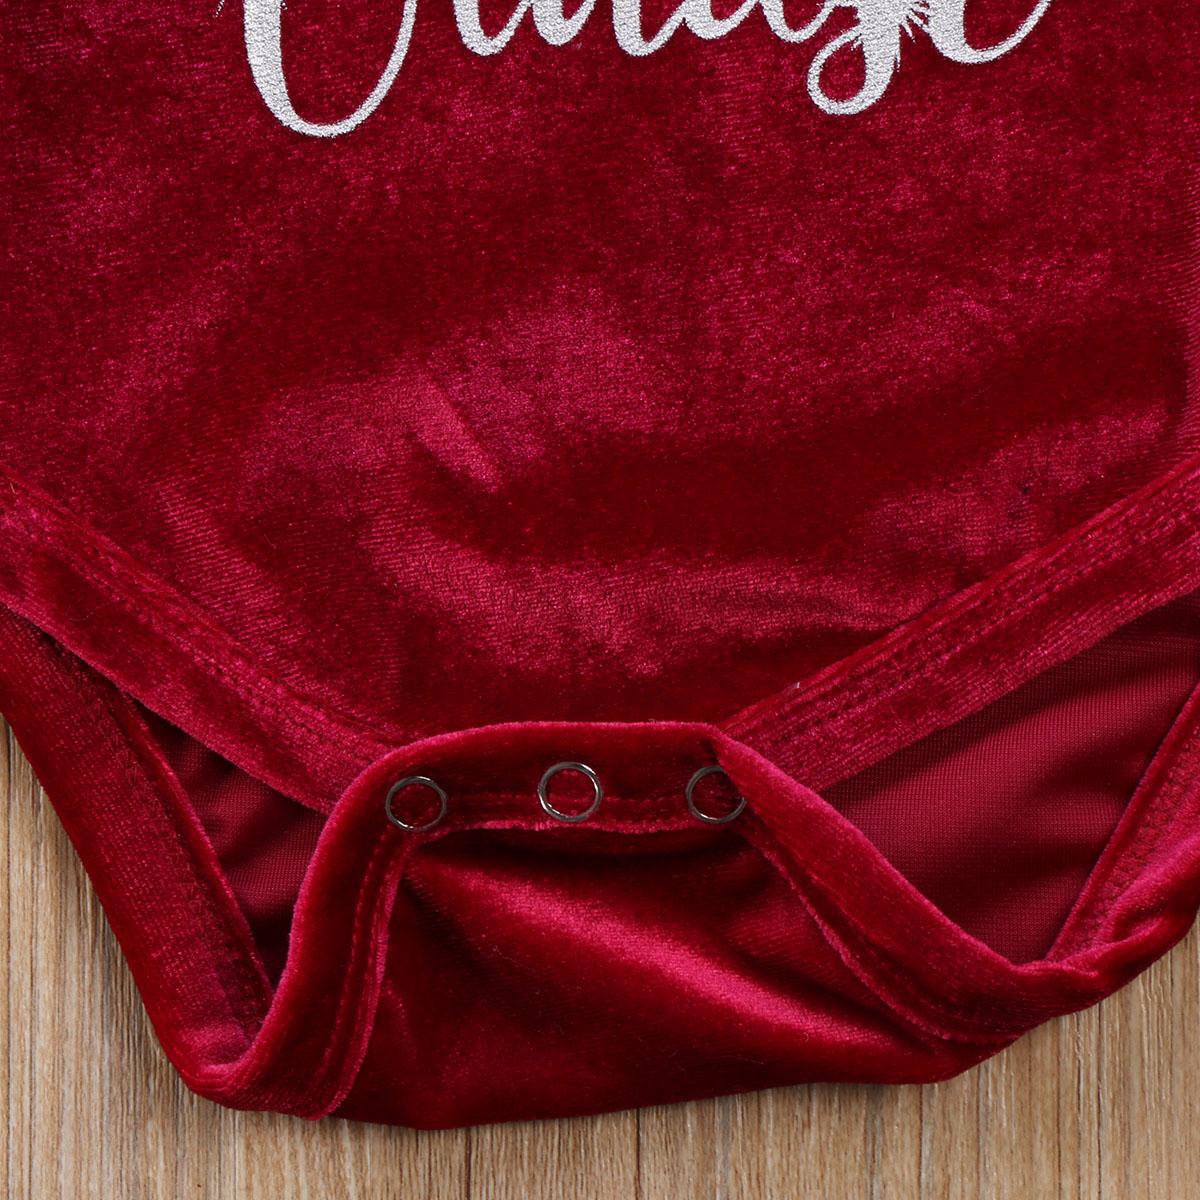 HTB1J3jzc4rI8KJjy0Fpq6z5hVXar Pudcoco 2017 New Pleuche Christmas Baby Girls Romper long sleeves infant newborn baby jumpsuit princess plush clothes xmas gift